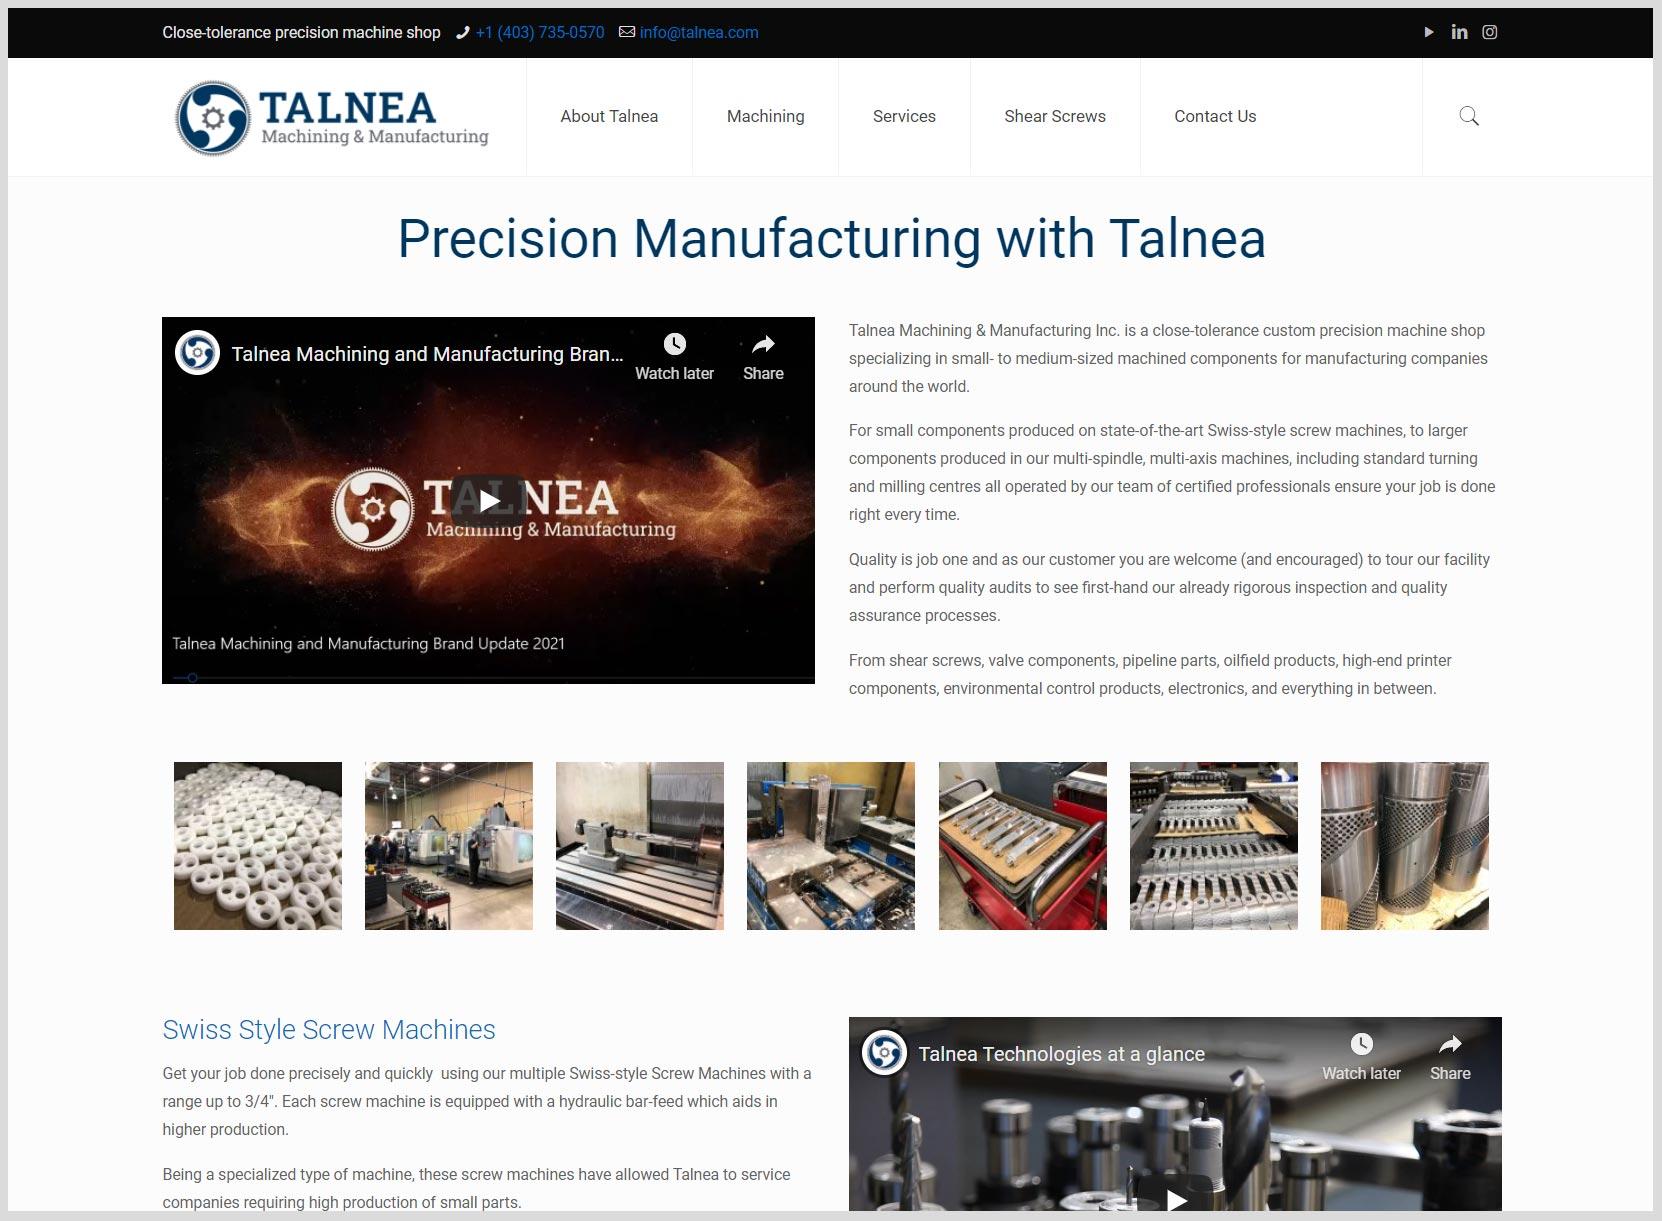 Talnea Machining and Manufacturing Website